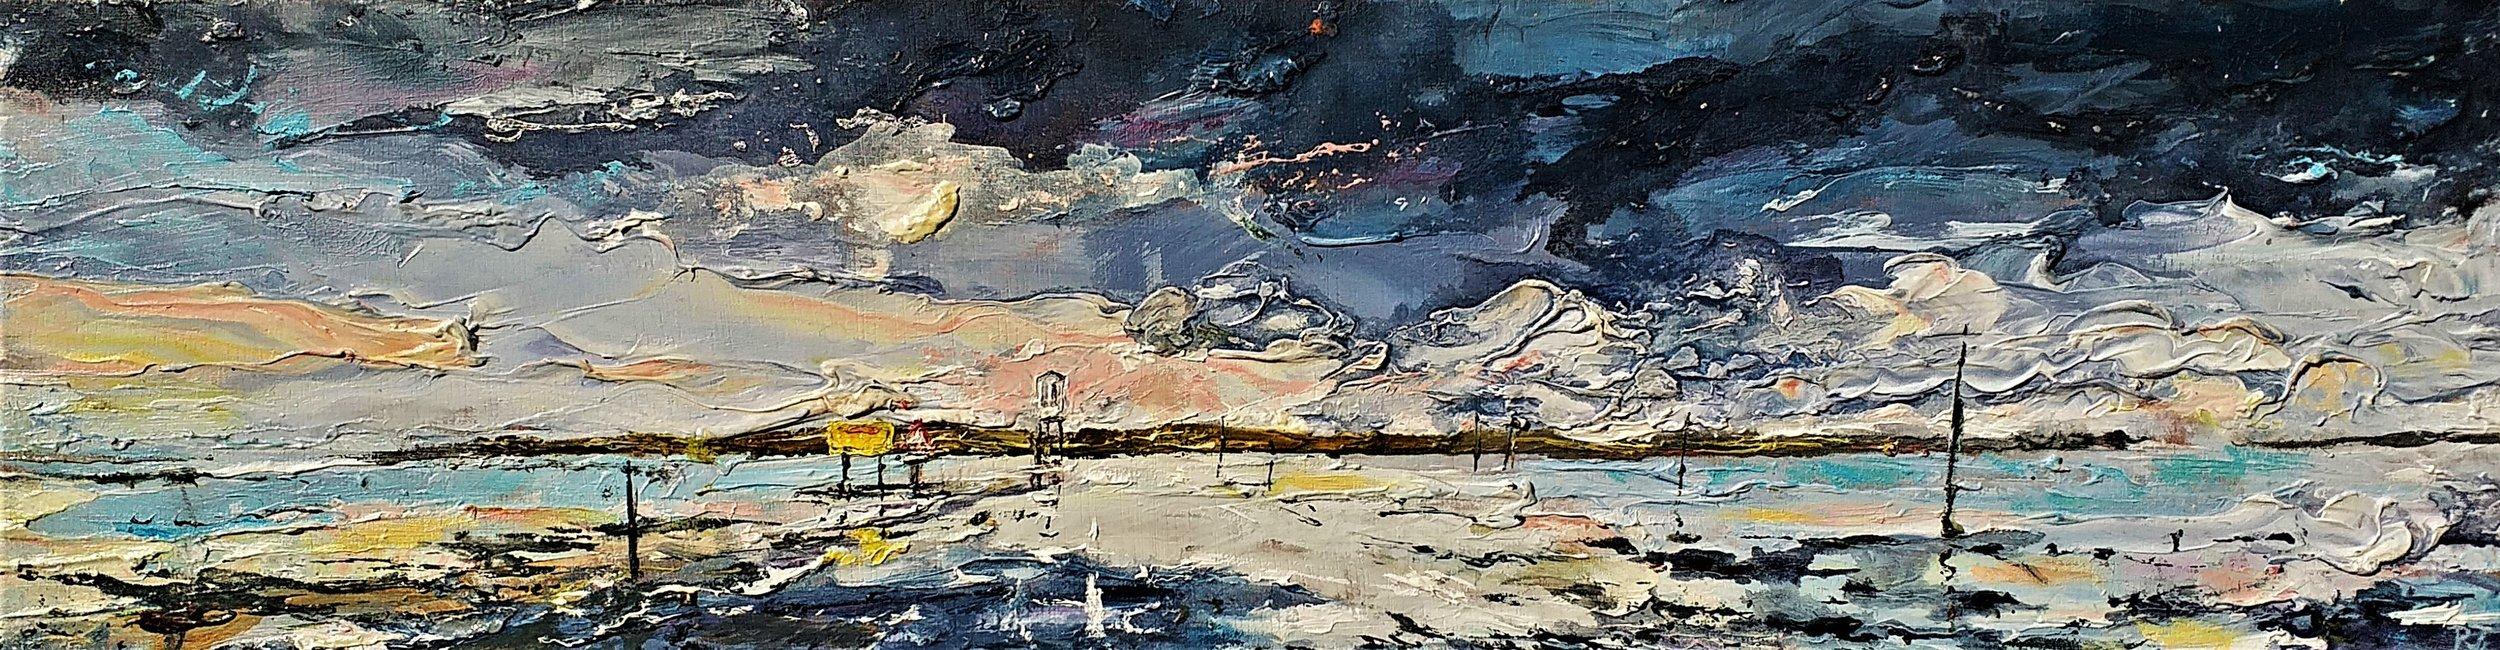 Holy Island Causeway, Northumbria